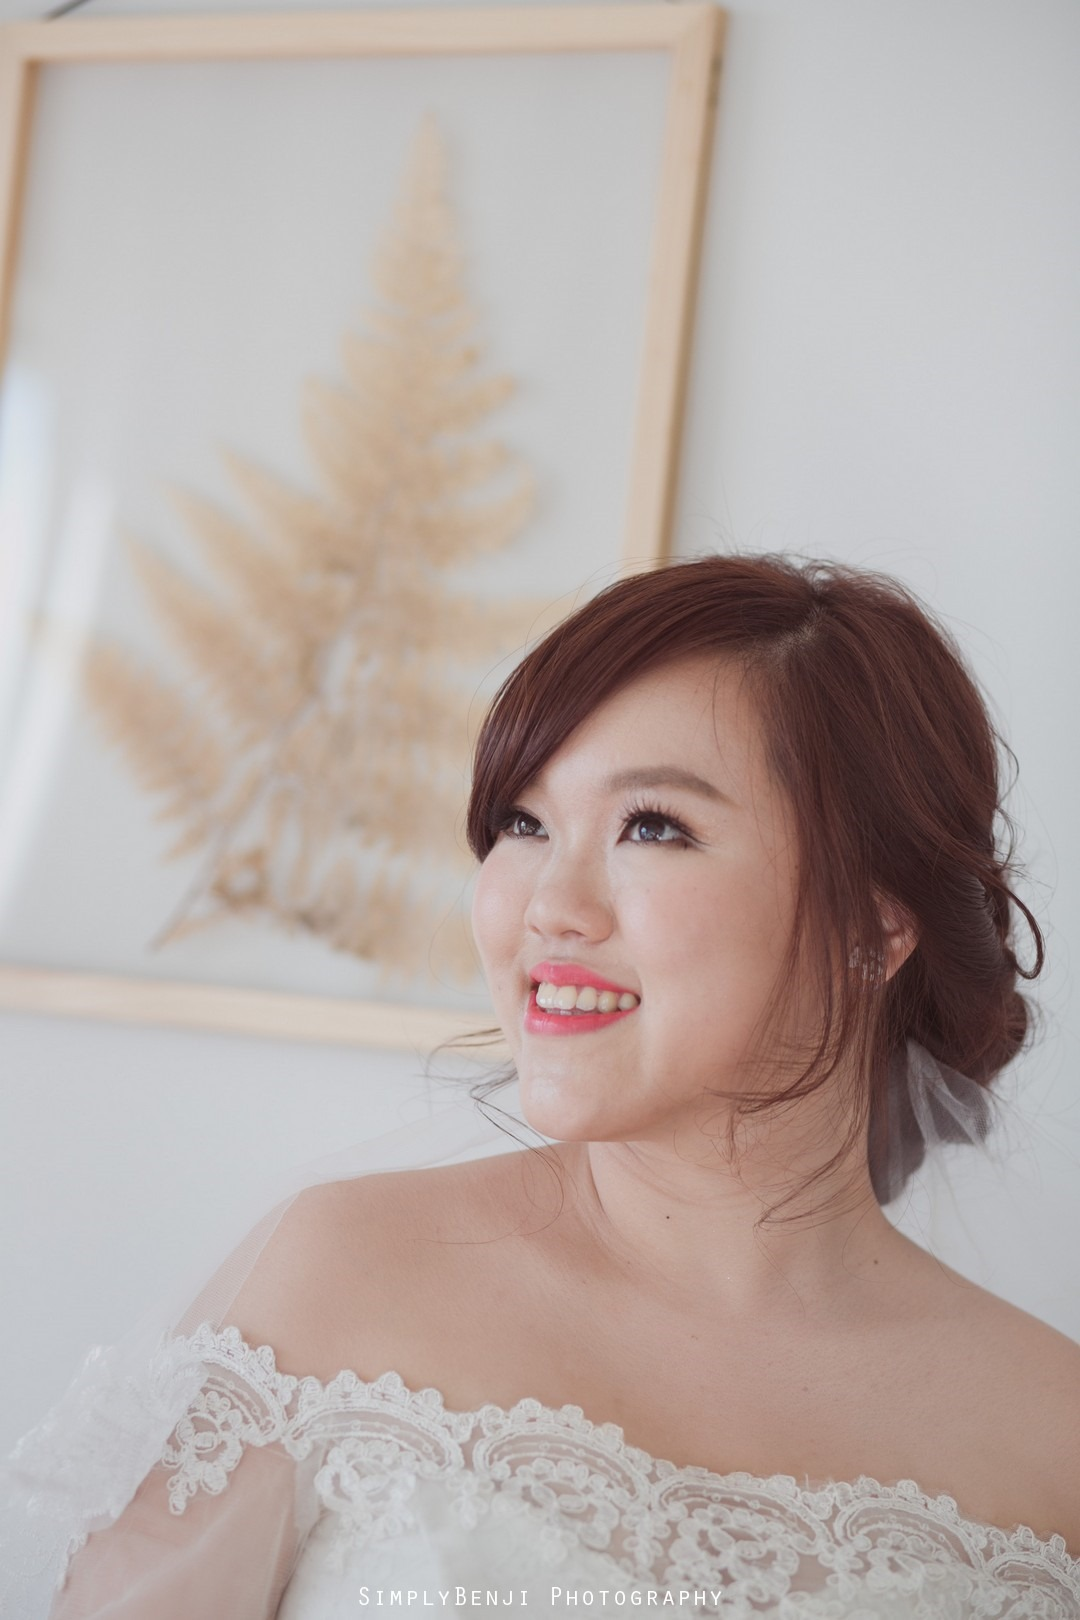 Chinese Wedding Gate Crashing at KM1 East Condominium & Wedding Reception at Concorde Hotel Kuala Lumpur_00009